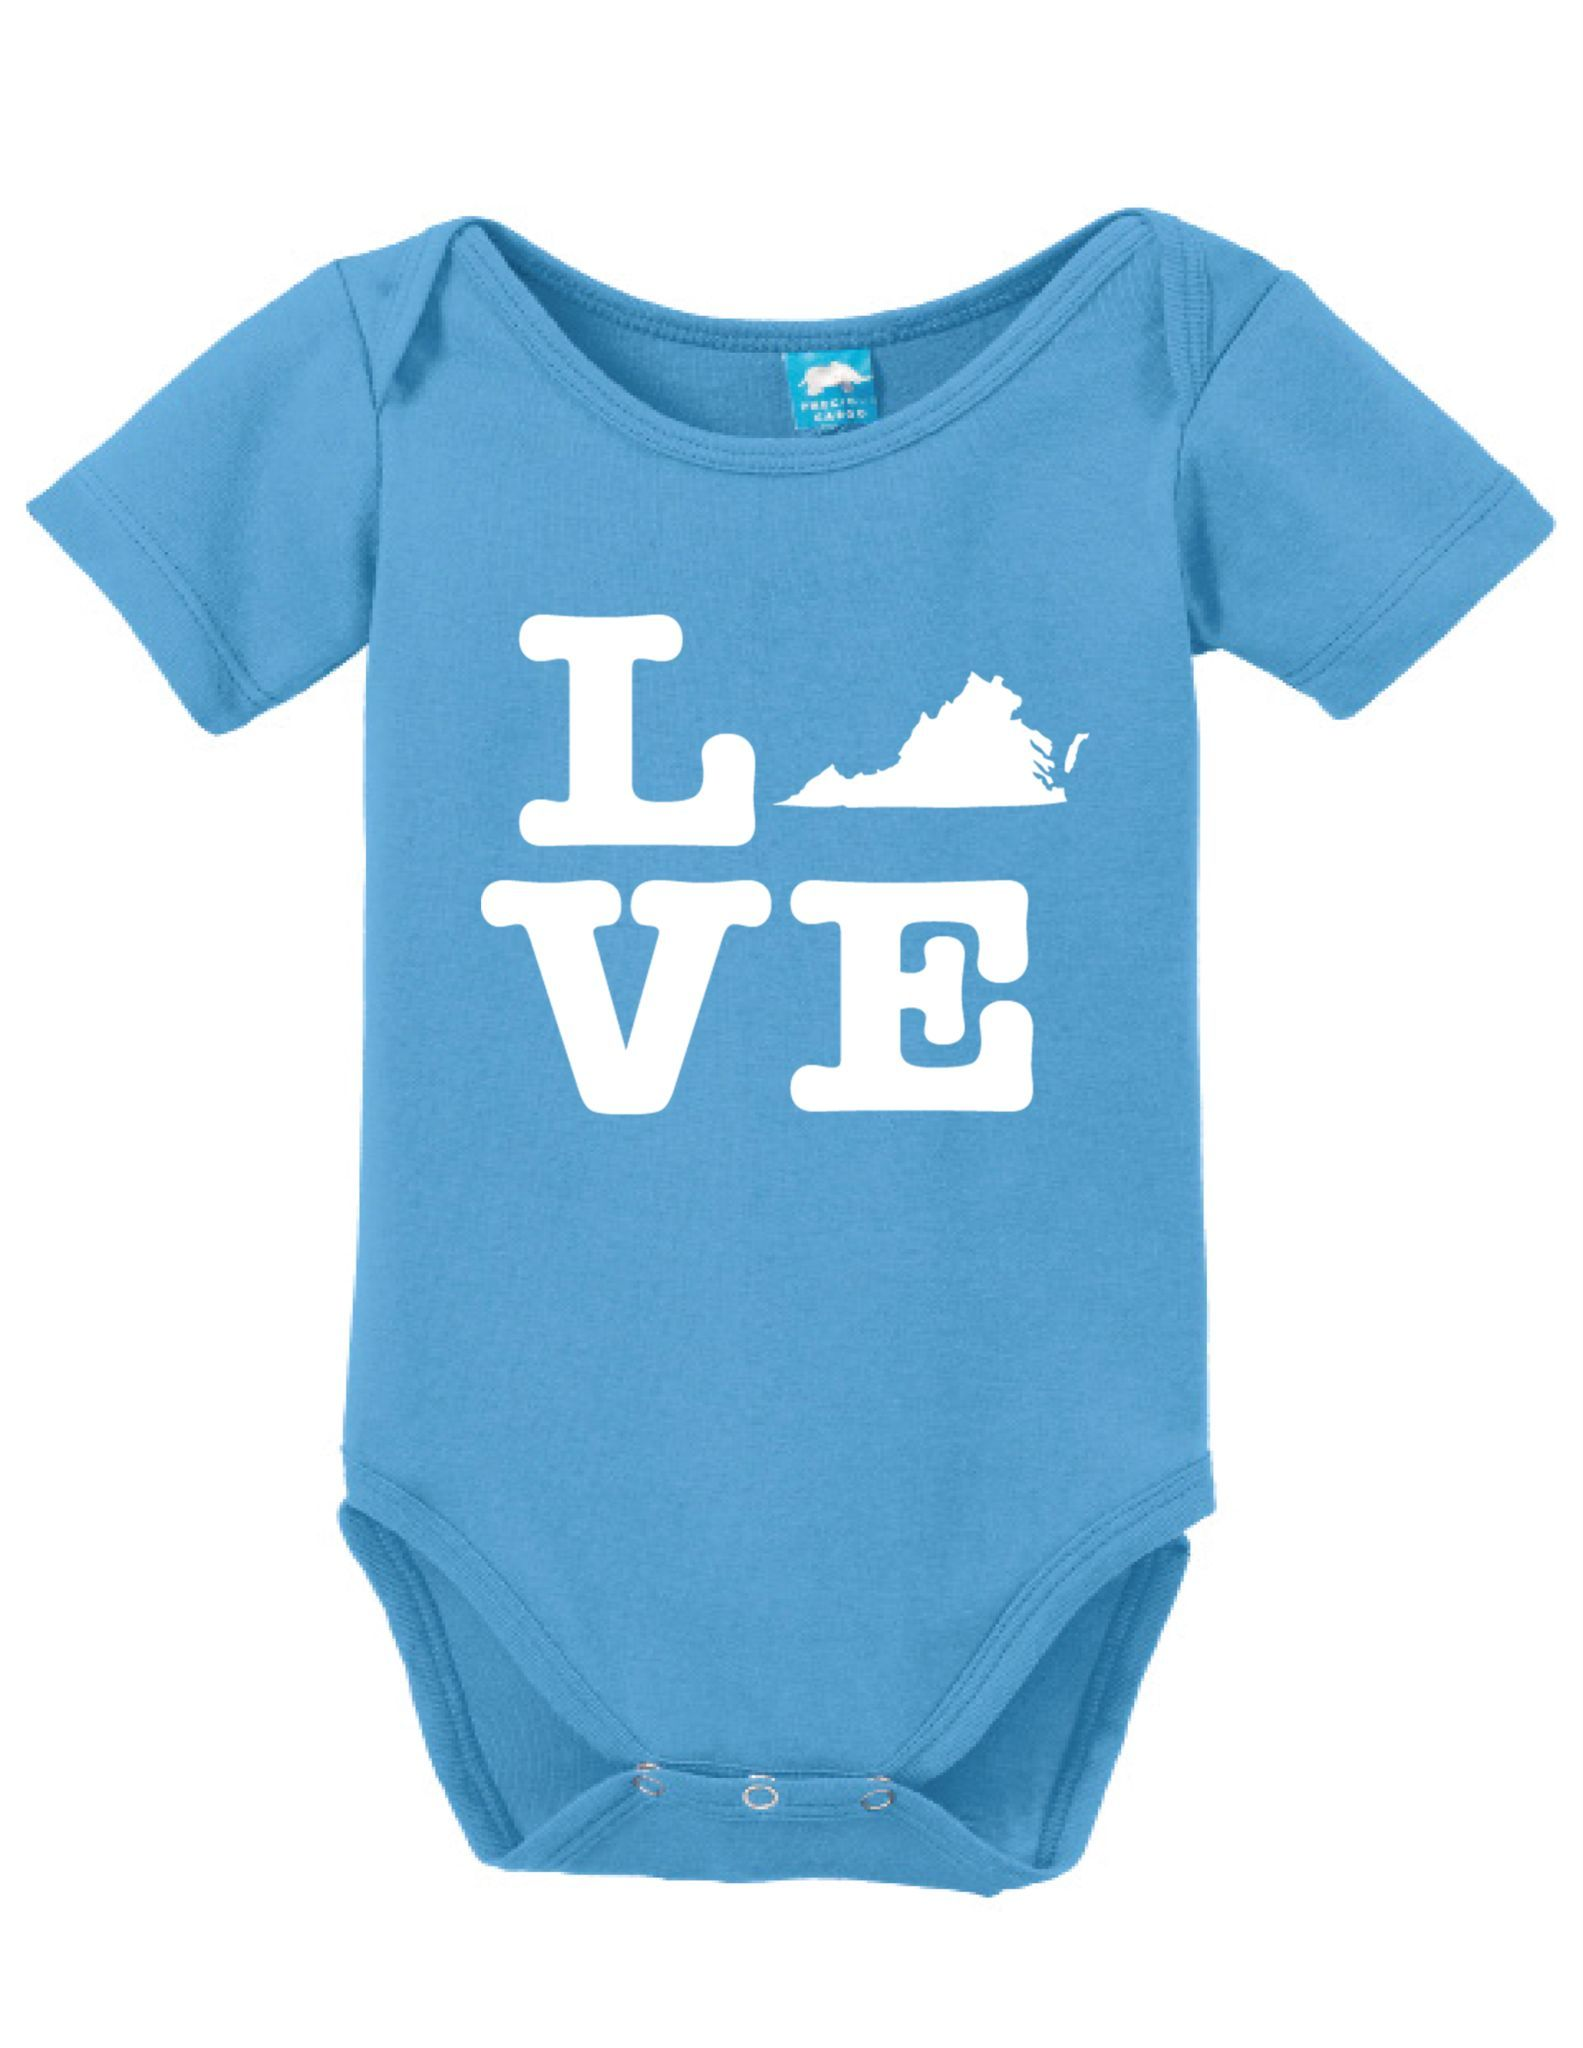 Virginia Love Onesie Funny Bodysuit Baby Romper